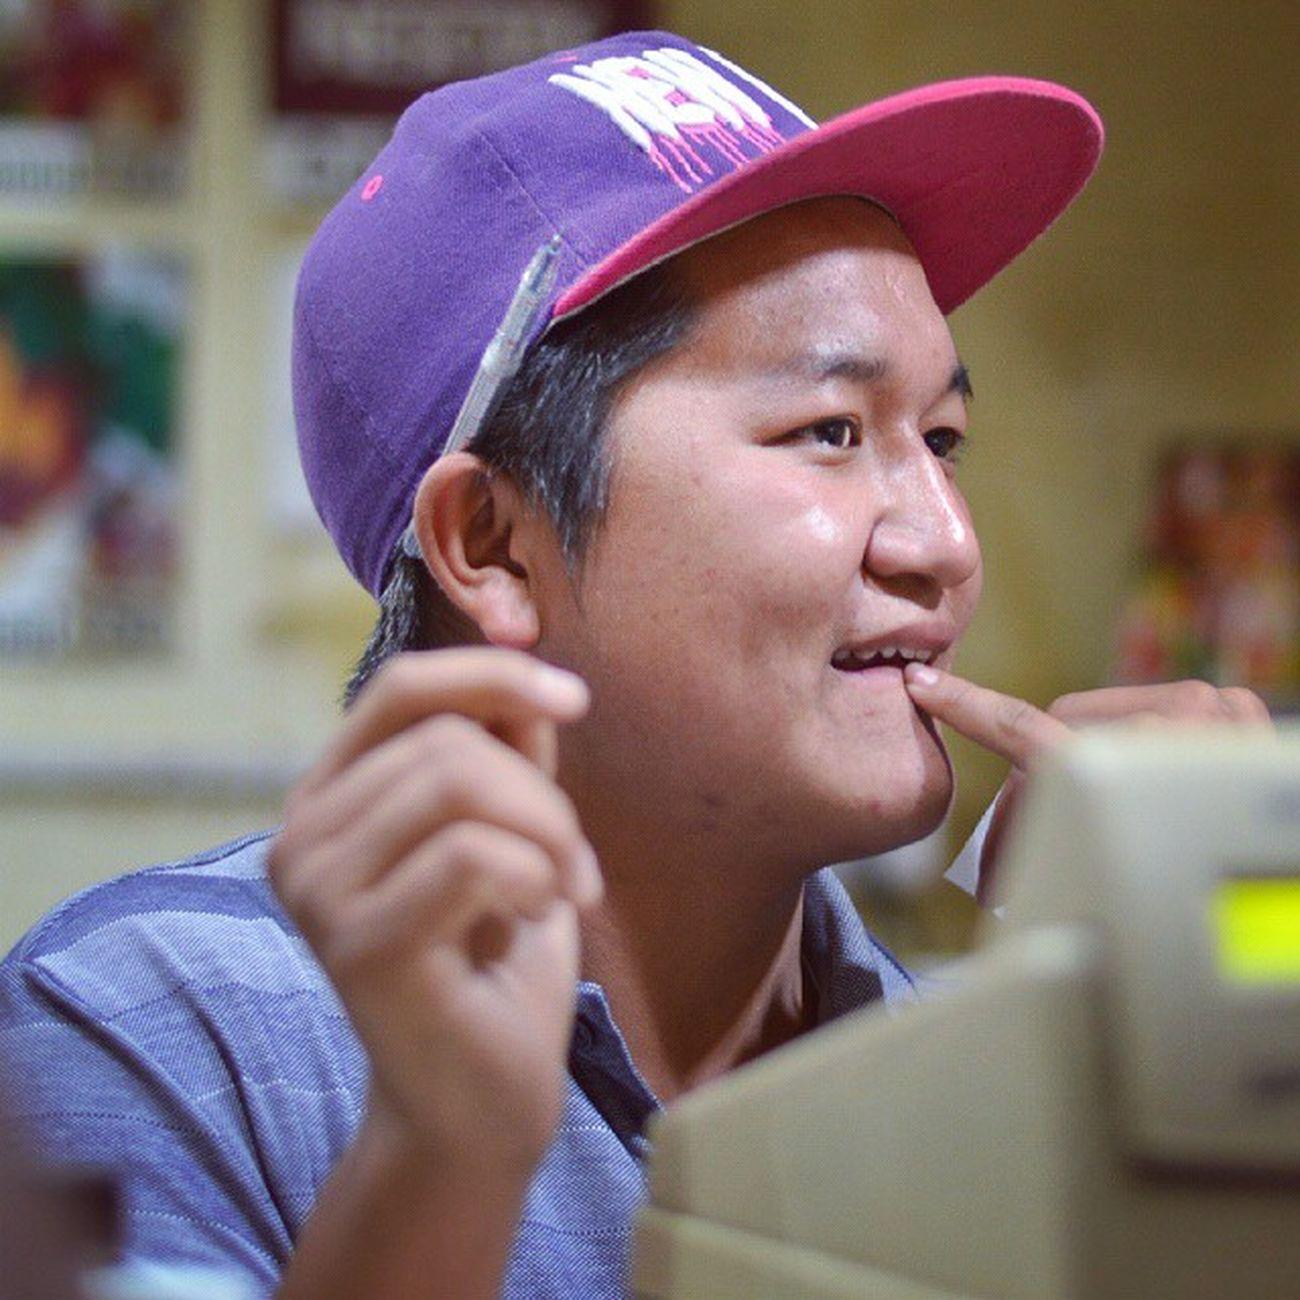 The Thinking Salesperson Icecream ParasDowntown Zirakpur Punjab India Nepal Hardworking Itravel IExplore IEat Iphotograph Iclick Ishoot Iamme IAmRevo Revo Revoshots Revoshotsphotography ExploringUnknown